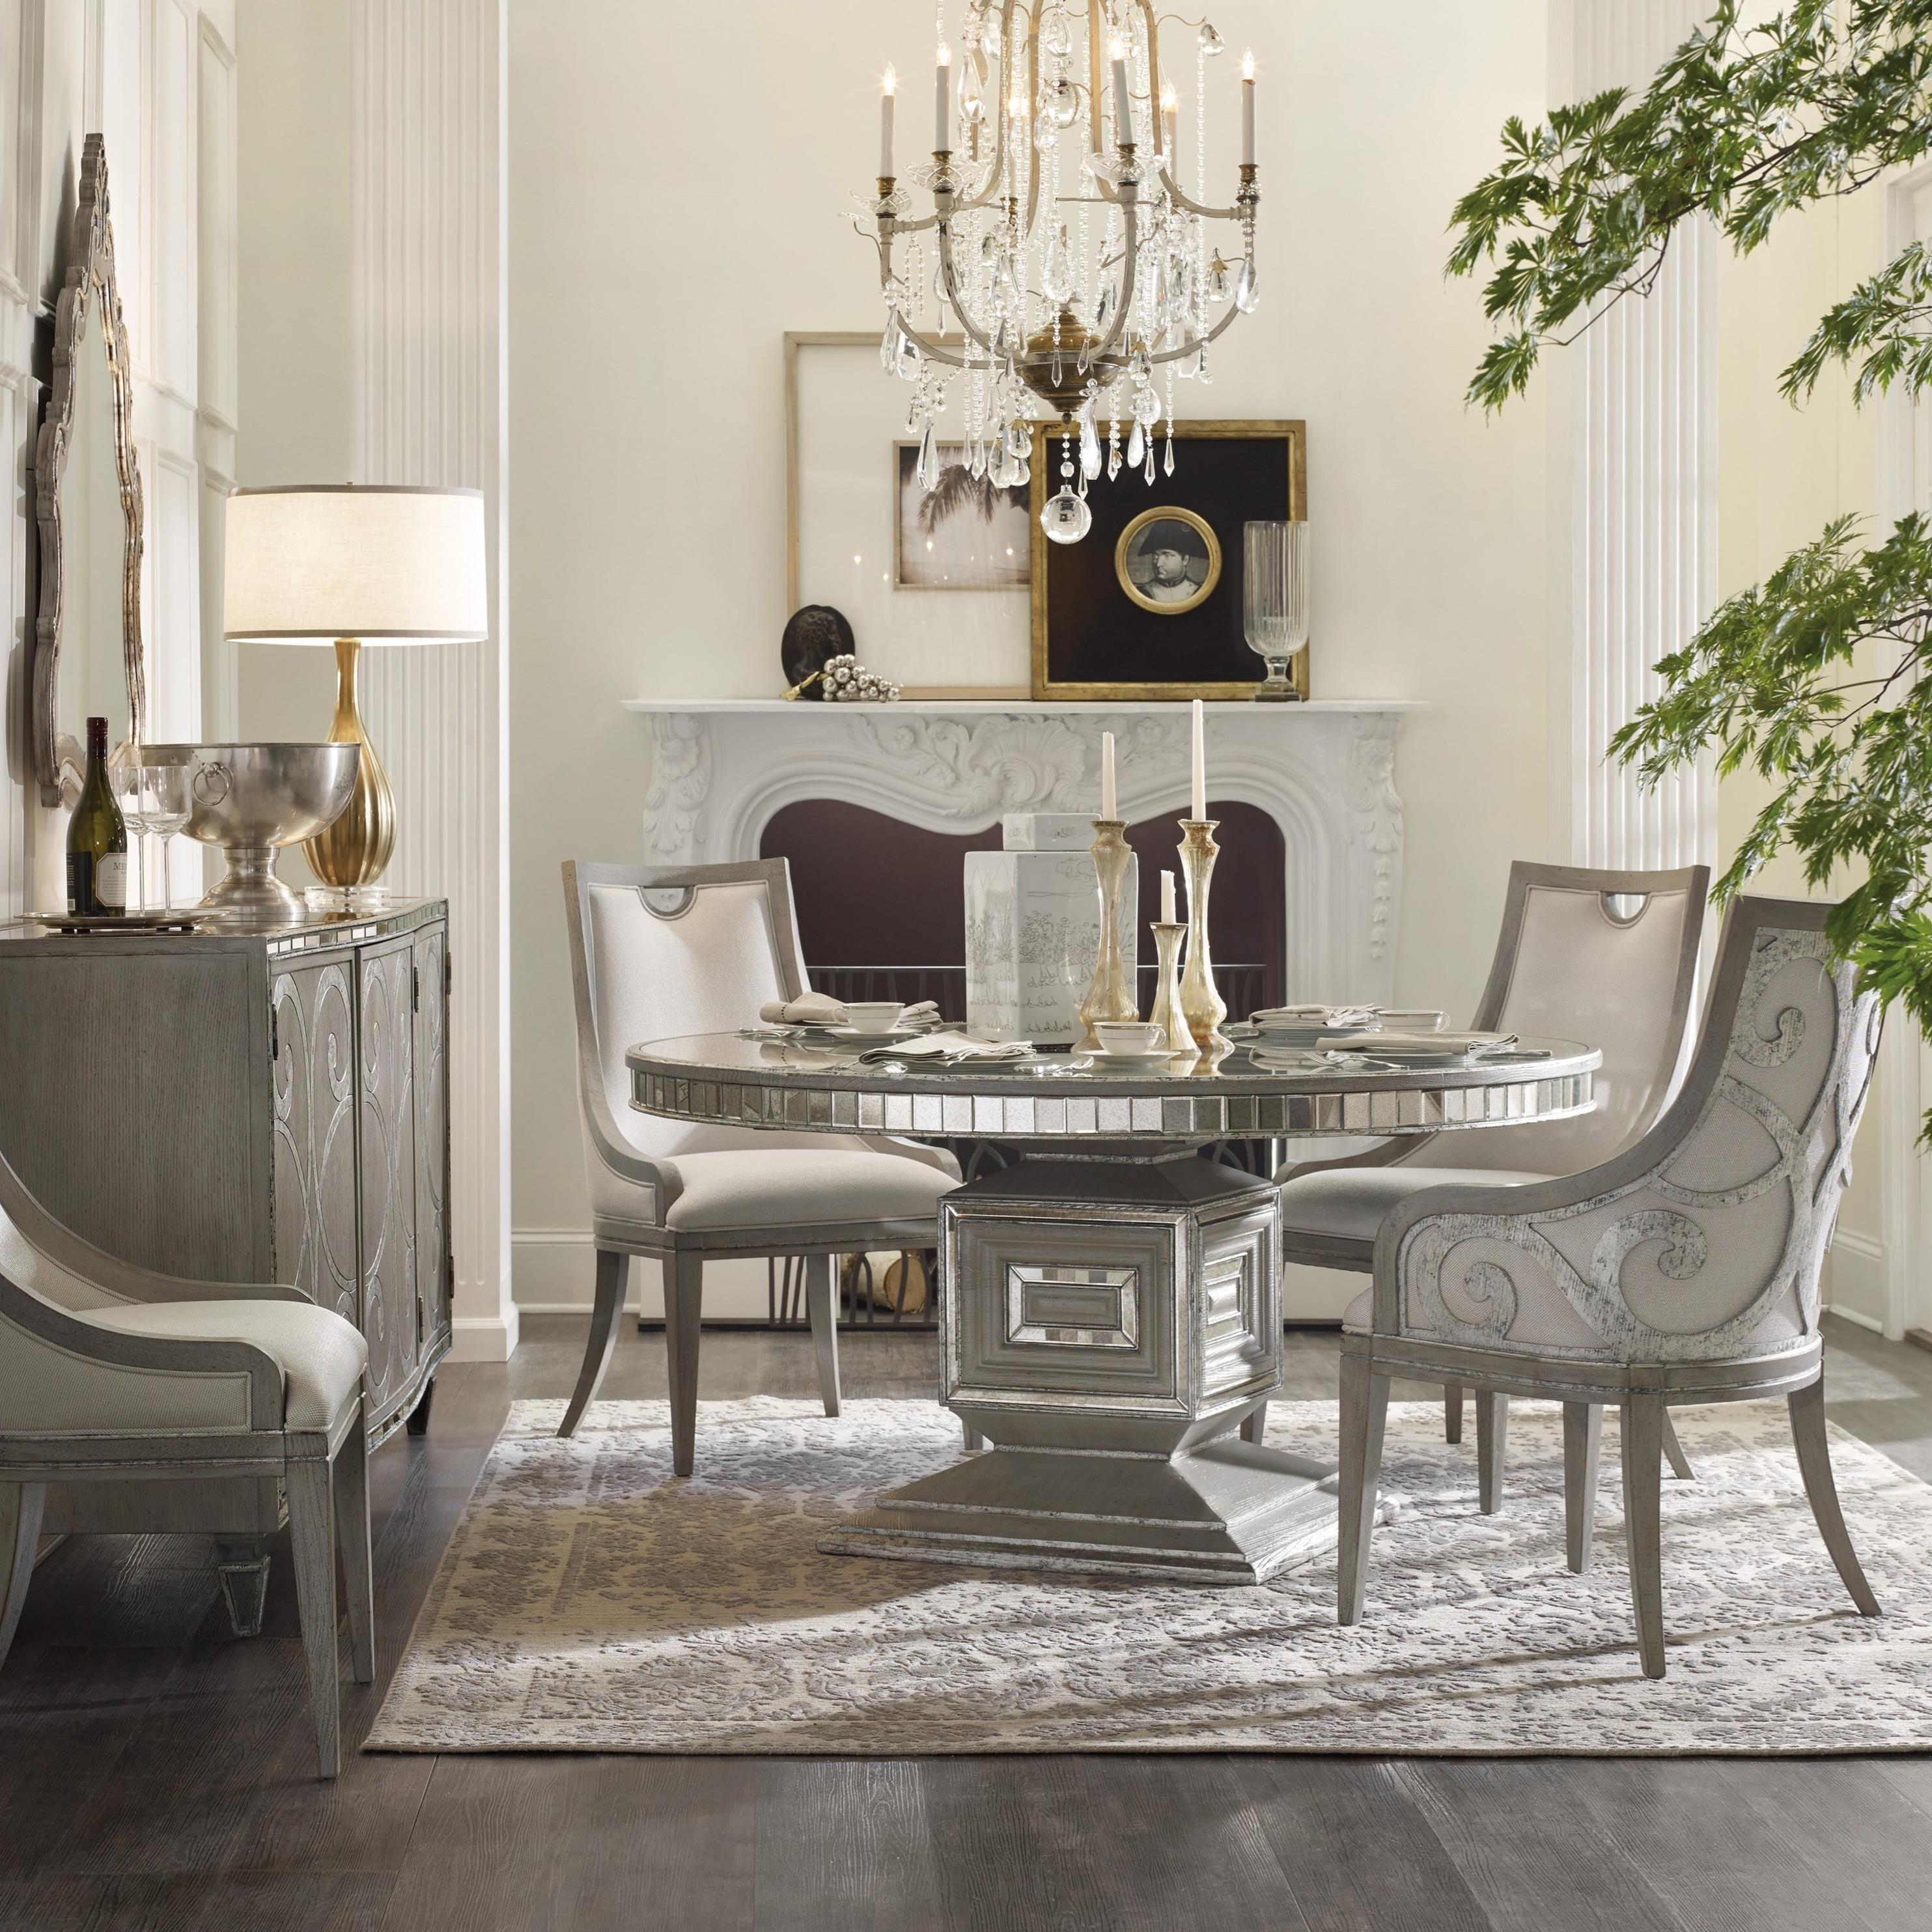 Hooker Furniture Sanctuary Transitional 5-Piece Dining Set